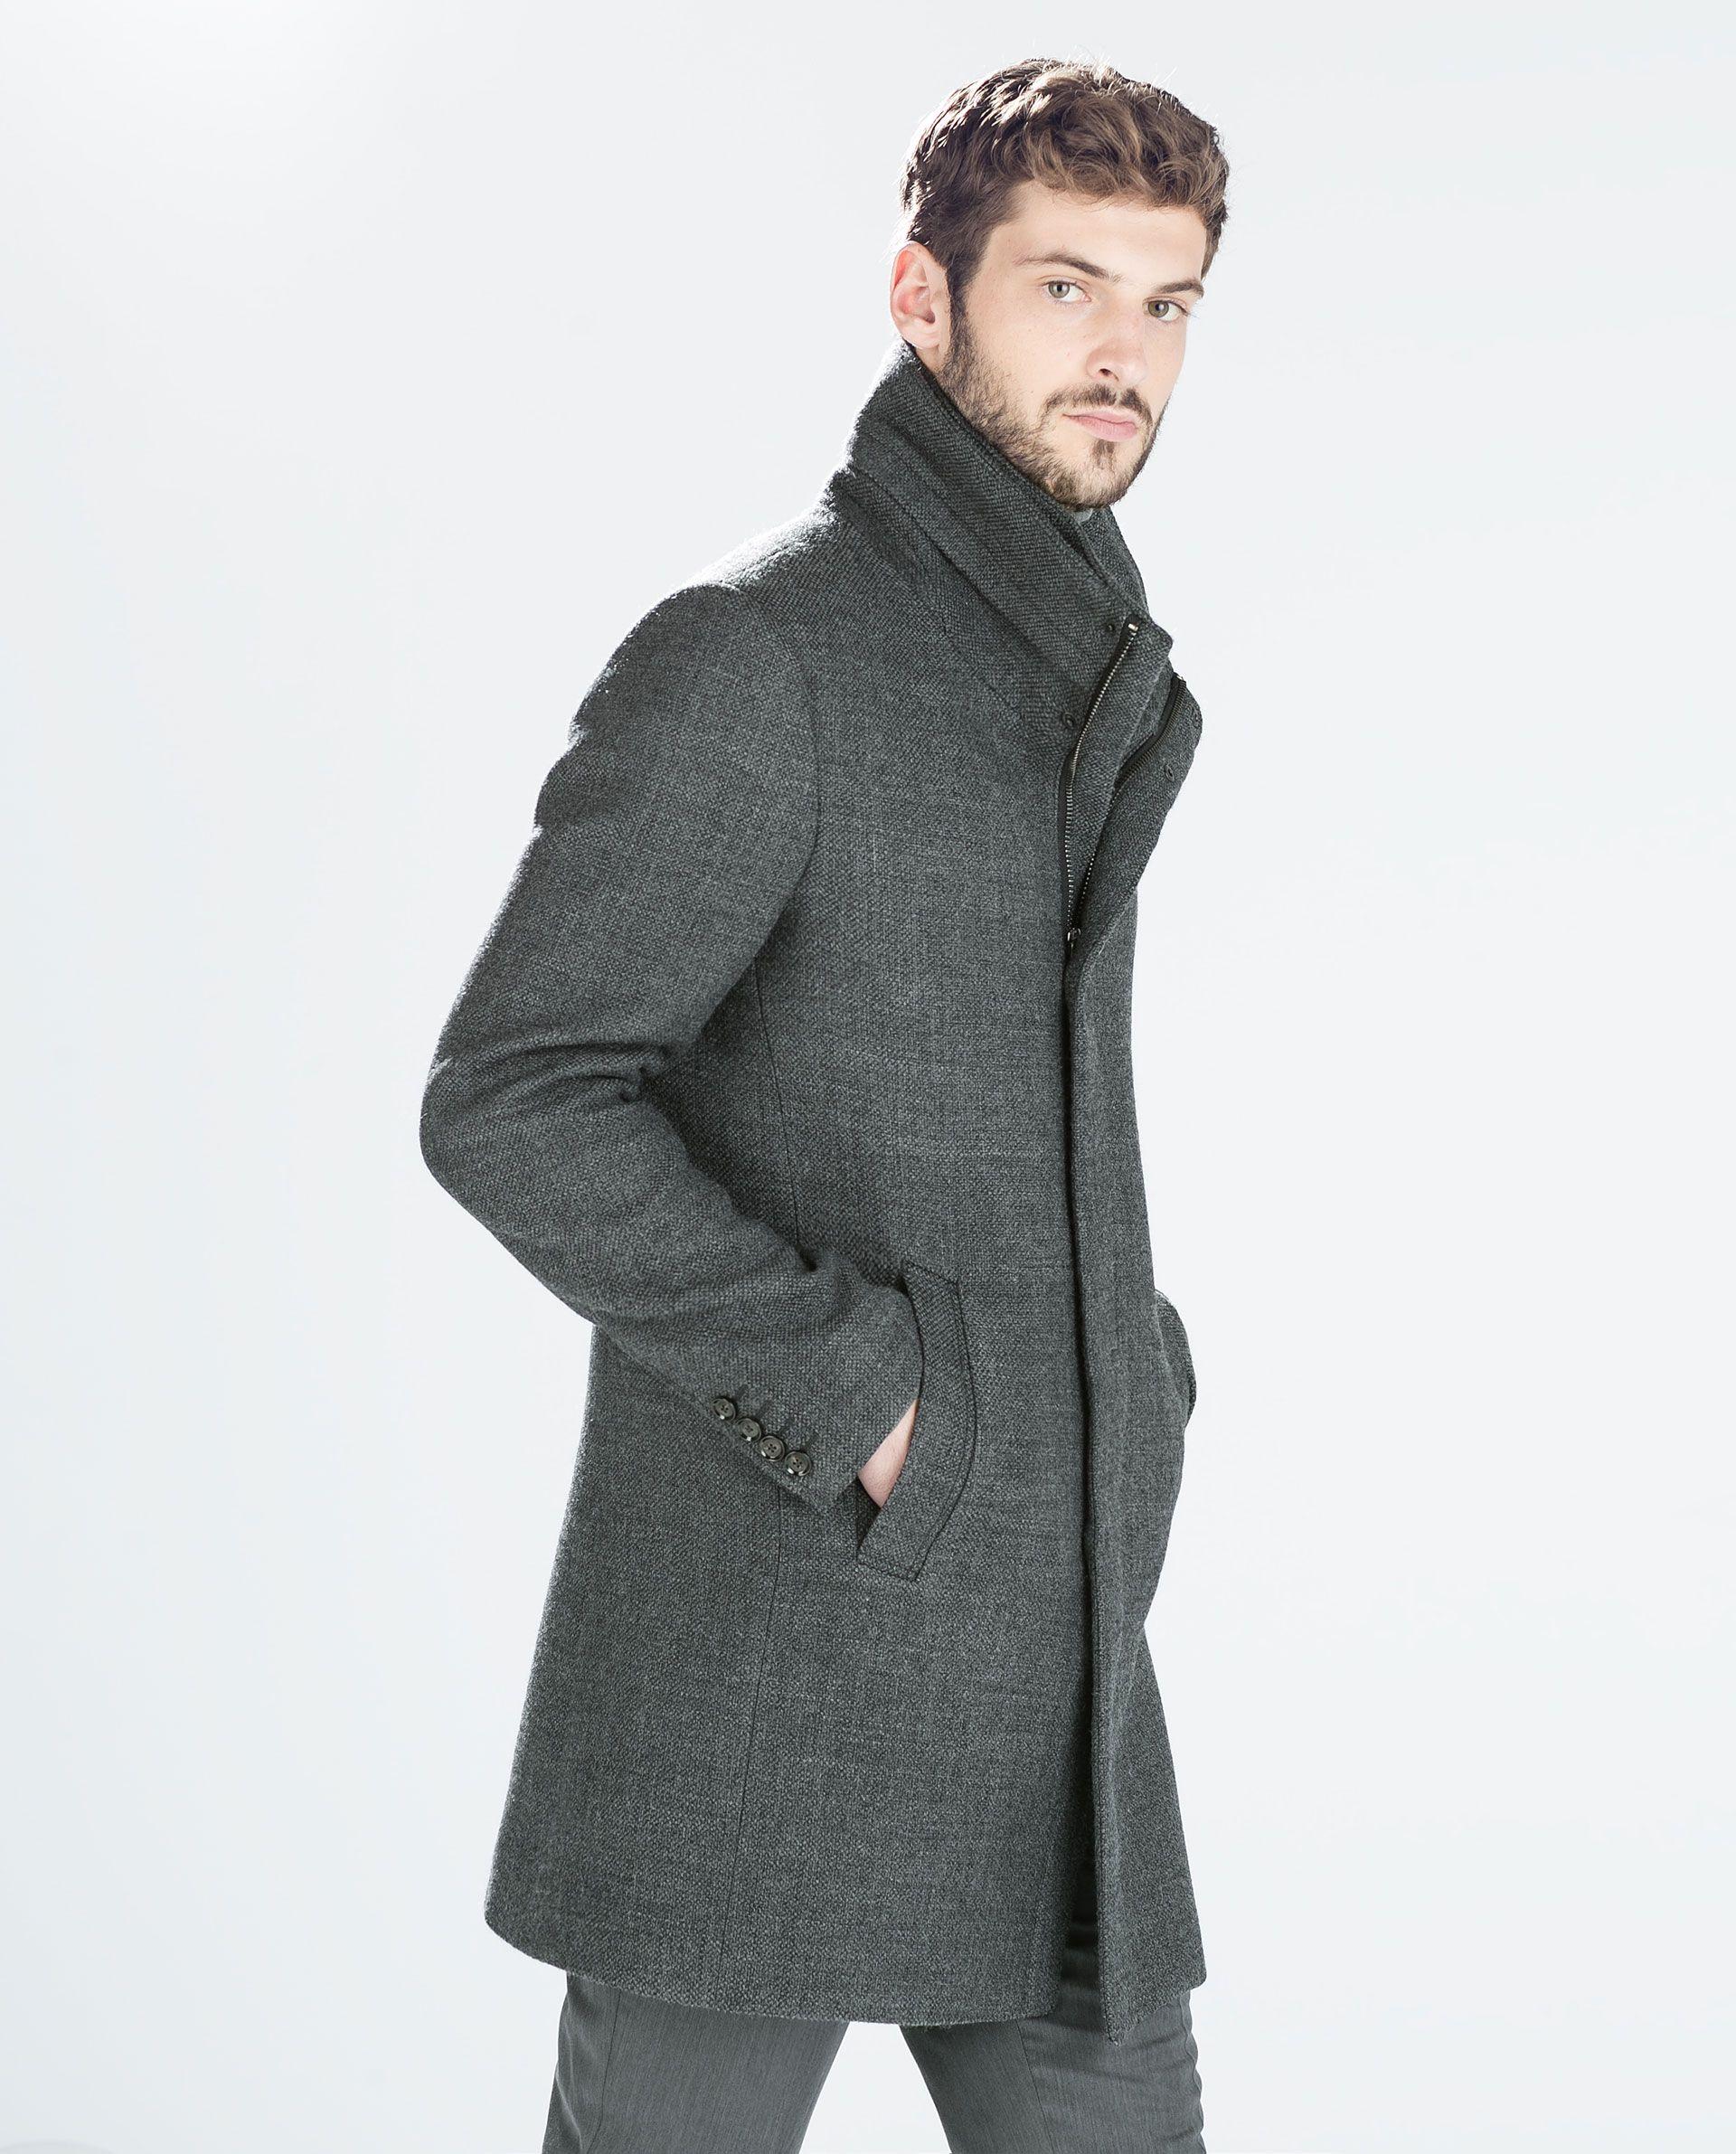 Hombre Liso Abrigo Men 2019Trench Zara In Coat Falso m0Nw8Ovn